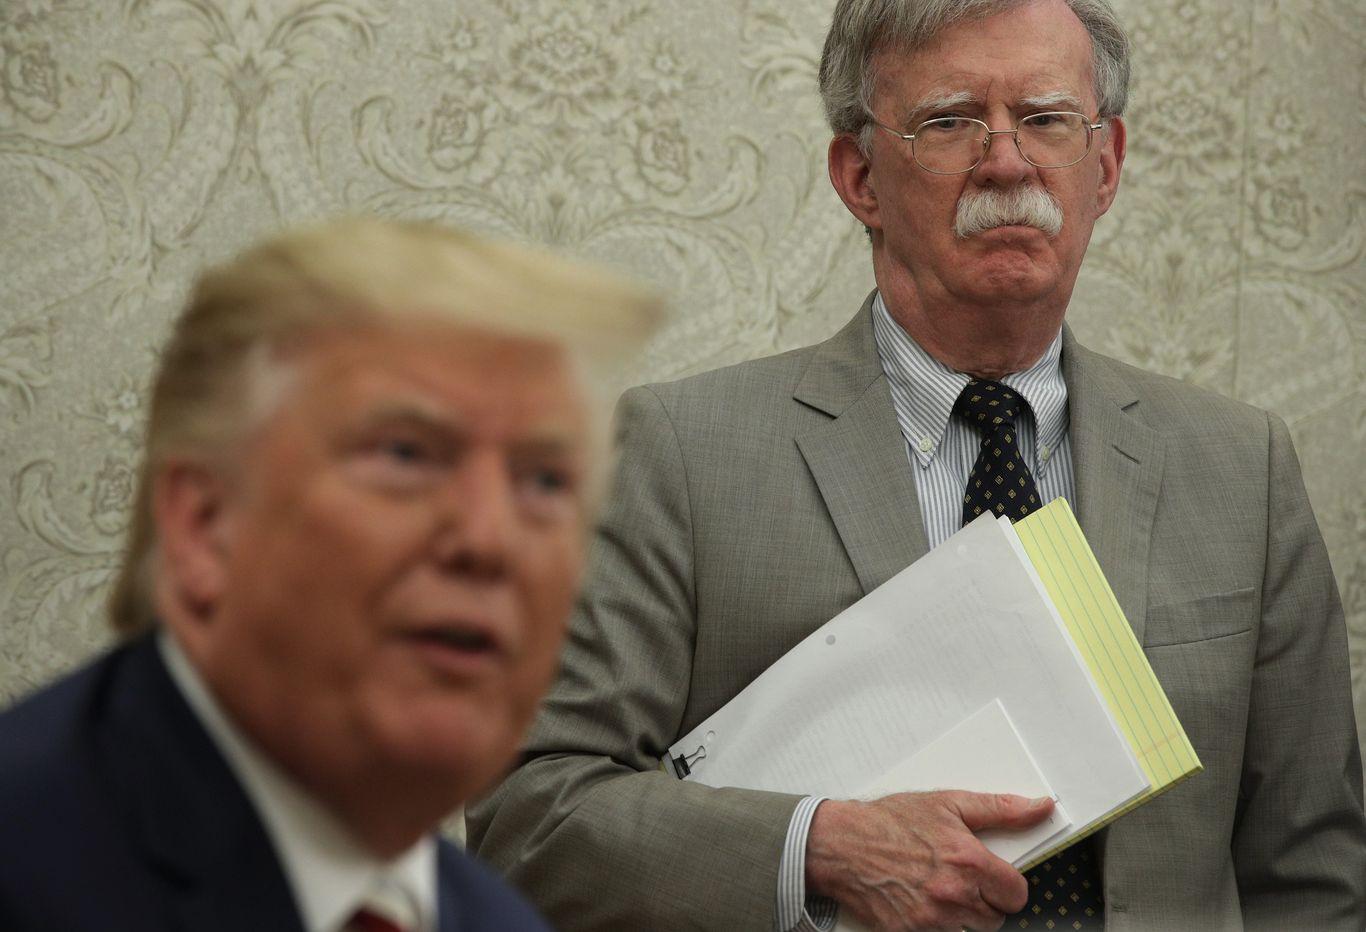 Judge denies Trump administration request to block Bolton book